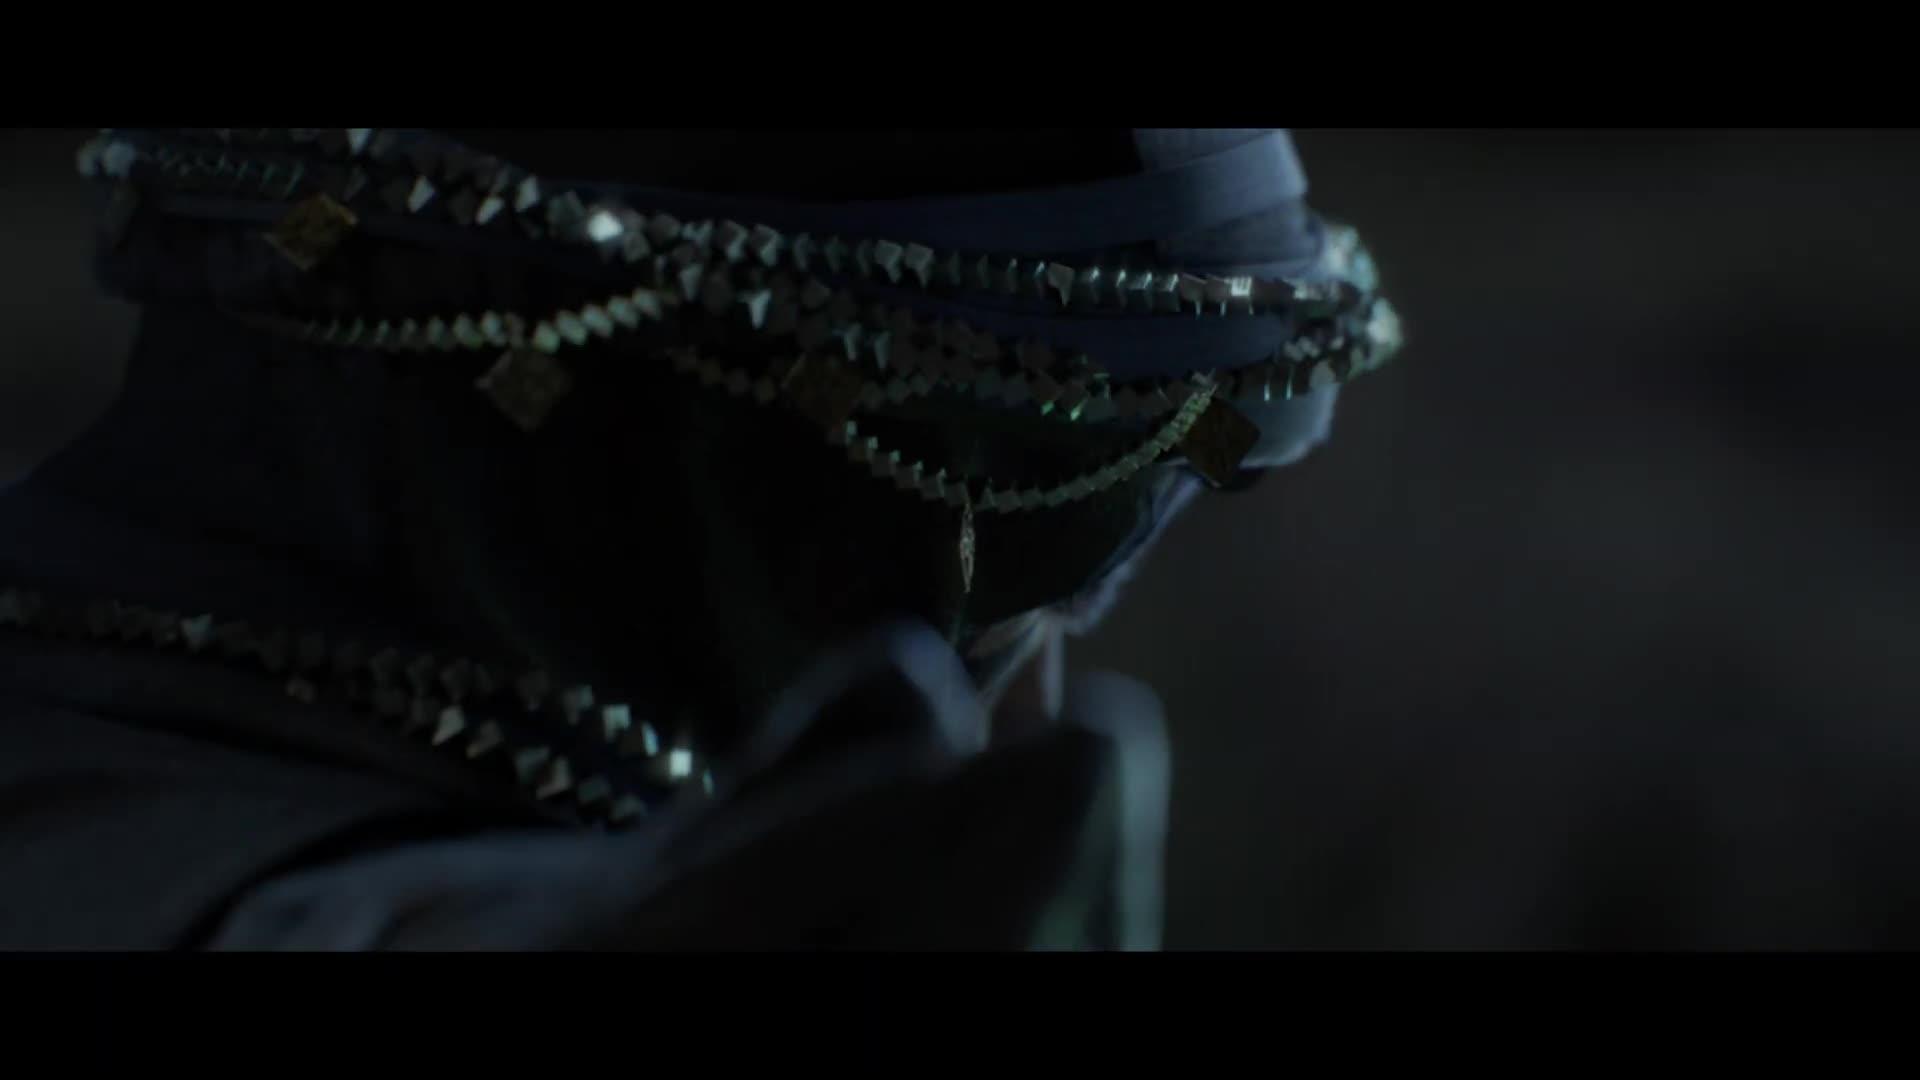 Destiny 2: Shadowkeep - Reveal Trailer [HD] screen capture